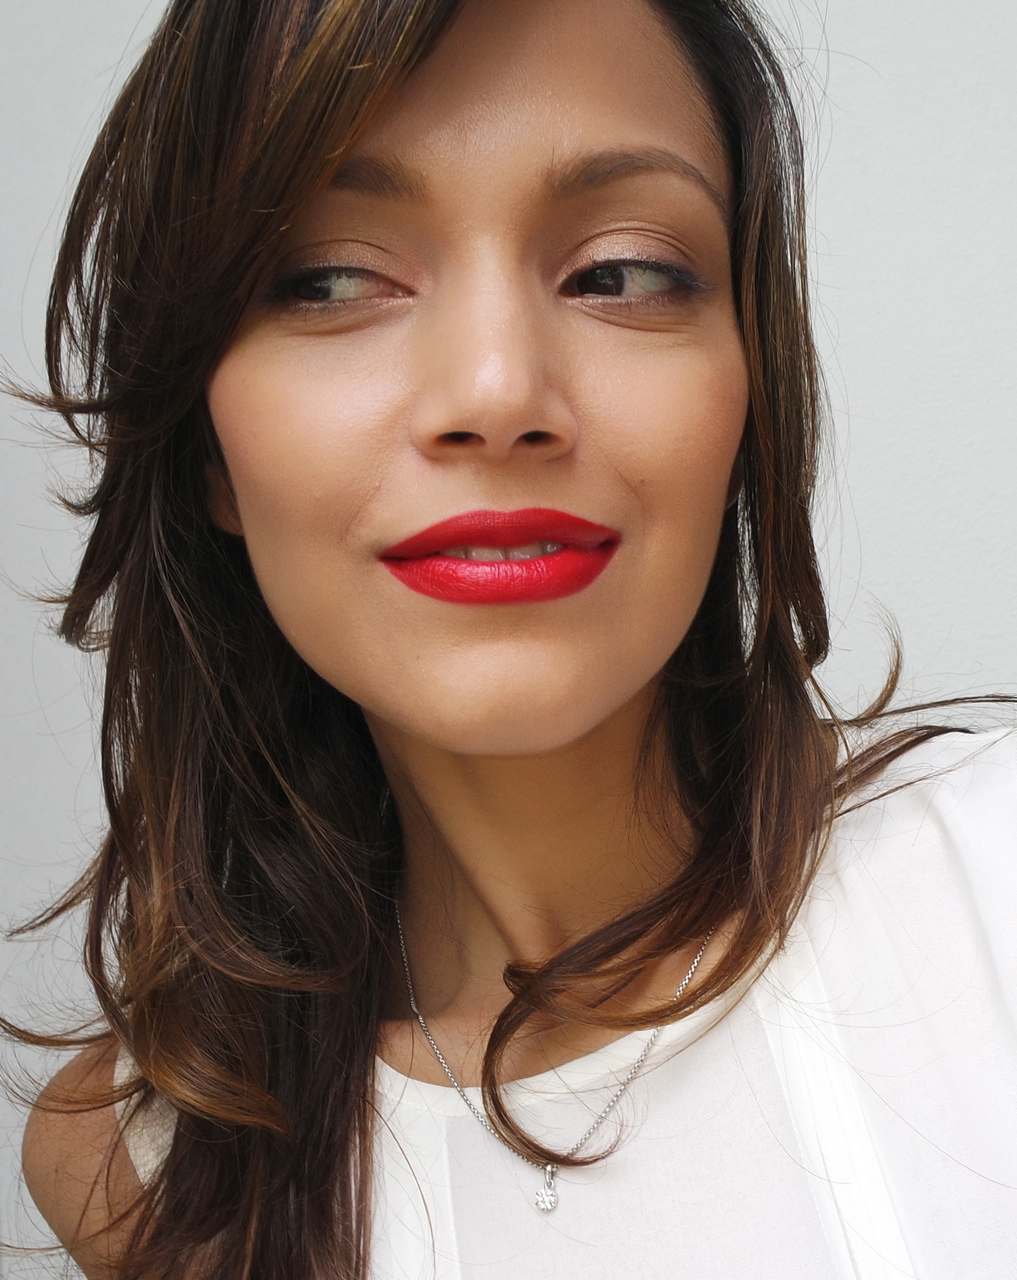 Flattering Lipstick Colors For All Skin Tones: Re: Best Red Lipsticks Flattering For Mo...